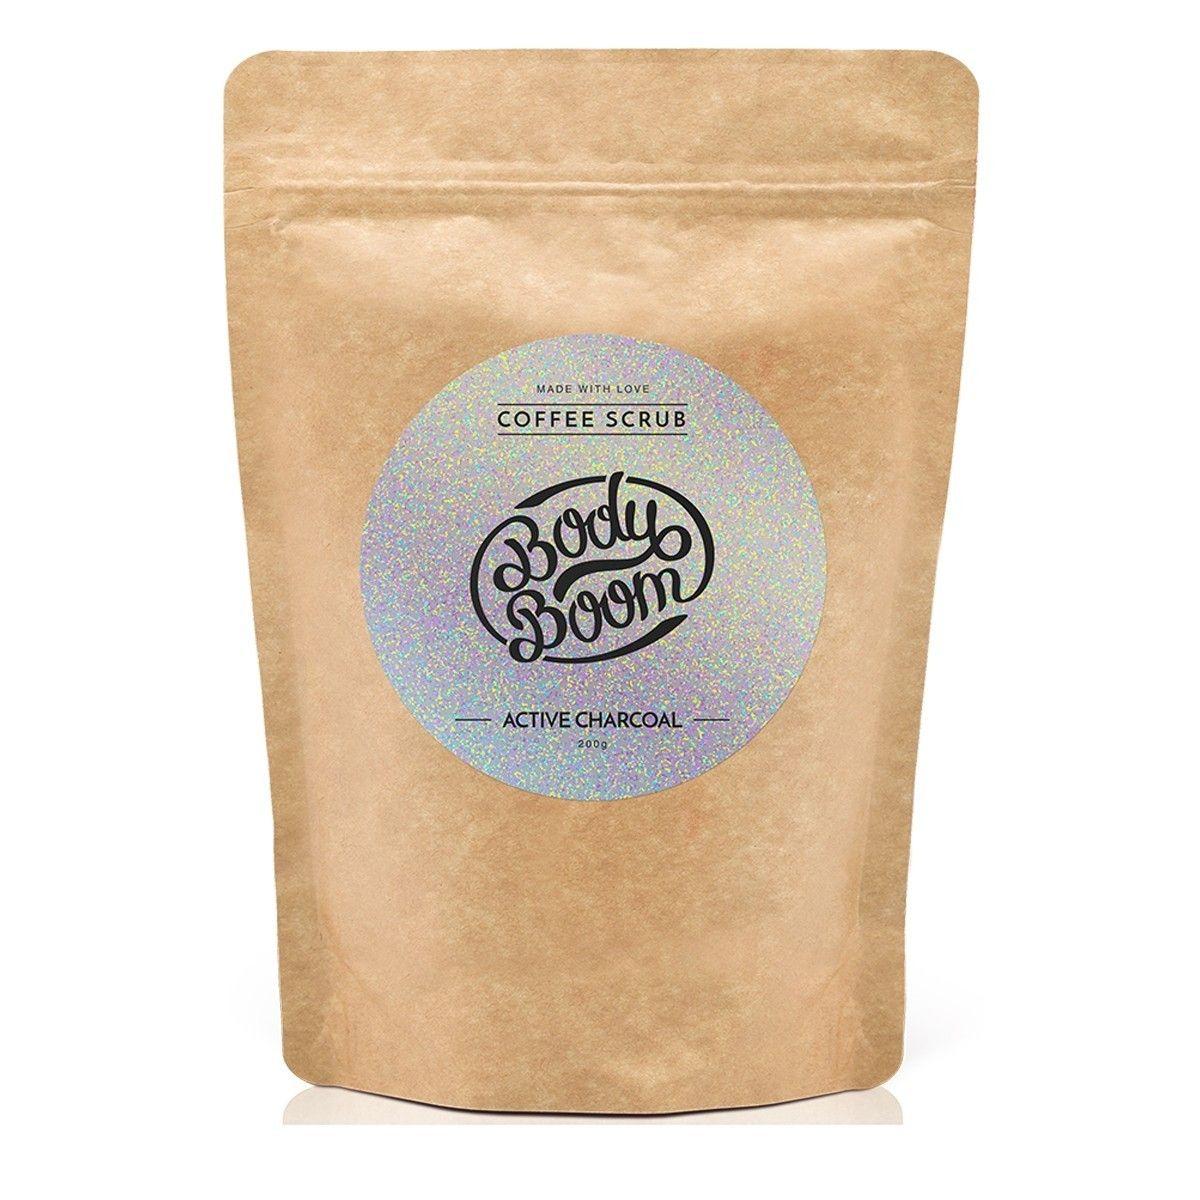 Afbeelding van Bodyboom Coffee Scrub Active Charcoal Bodyscrub Beauty